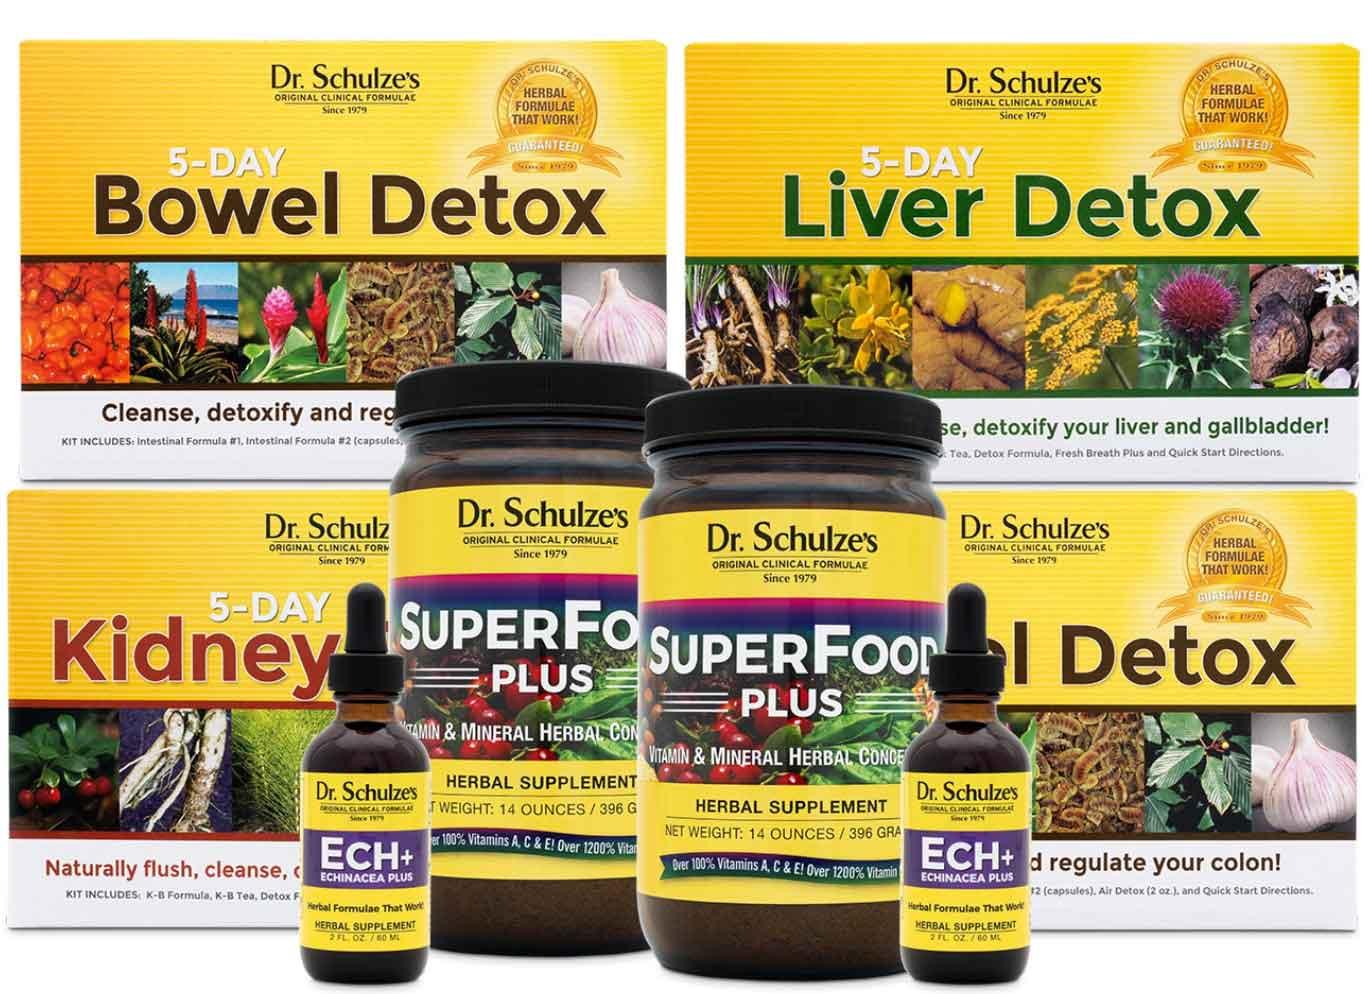 30-Day Detox, Save $50